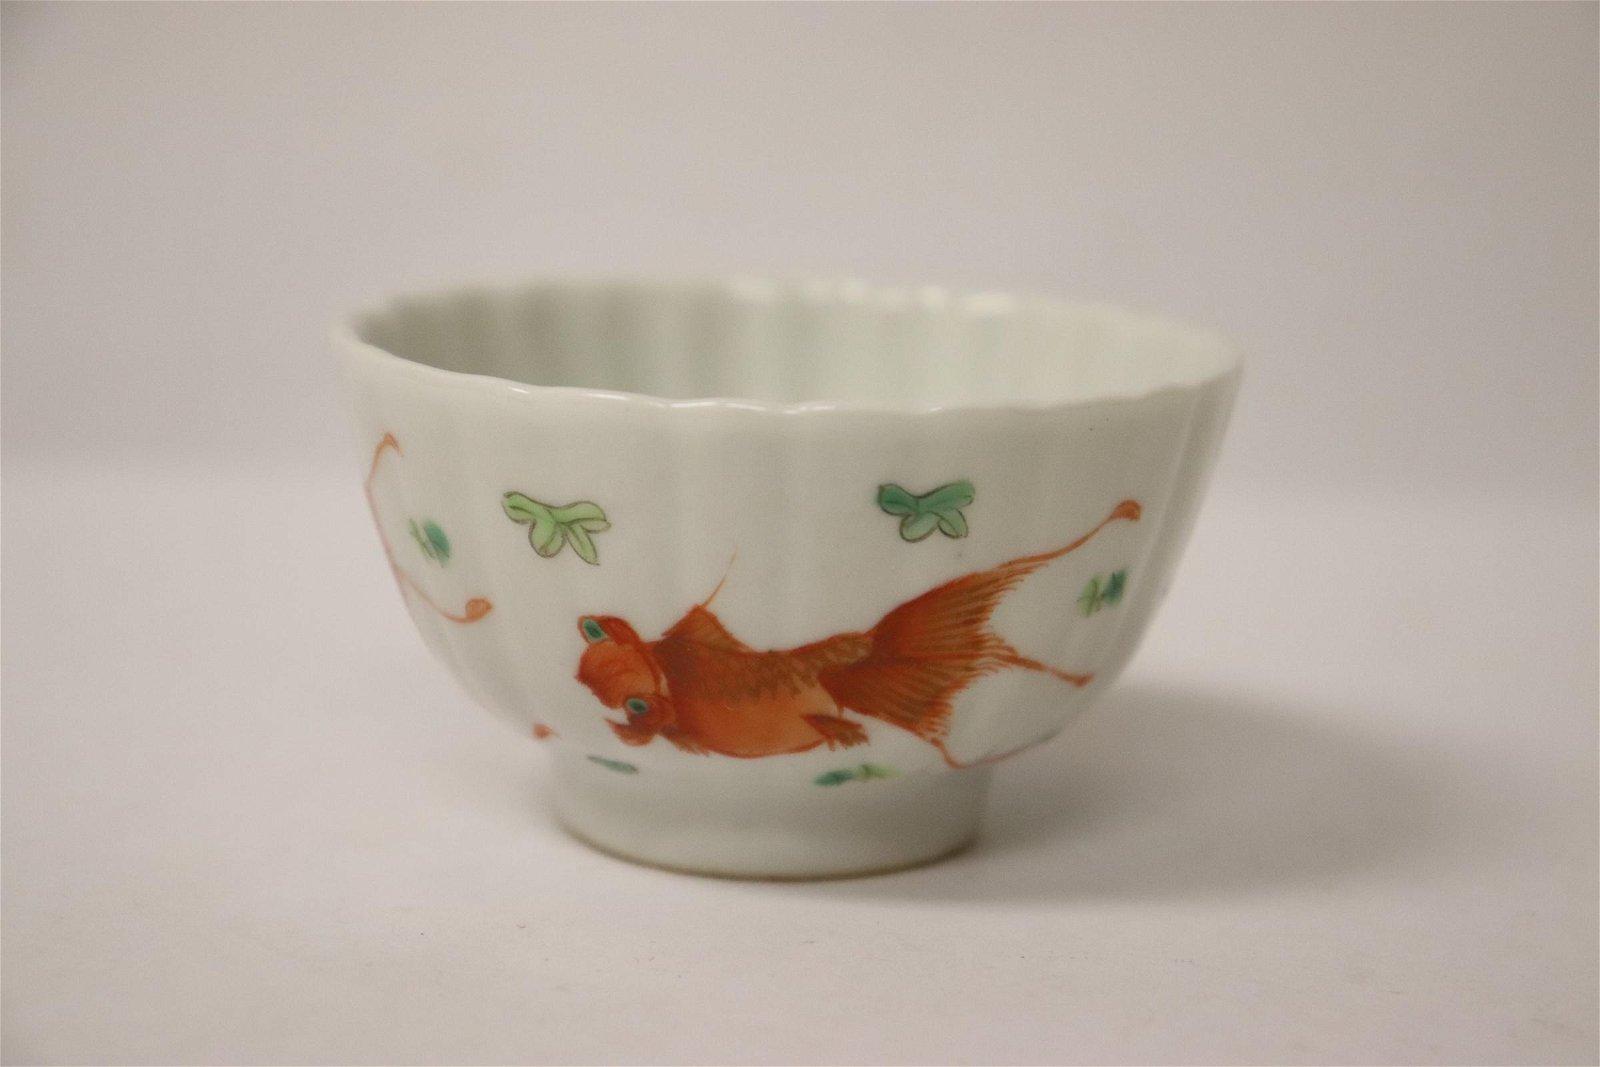 A wucai porcelain tea cup